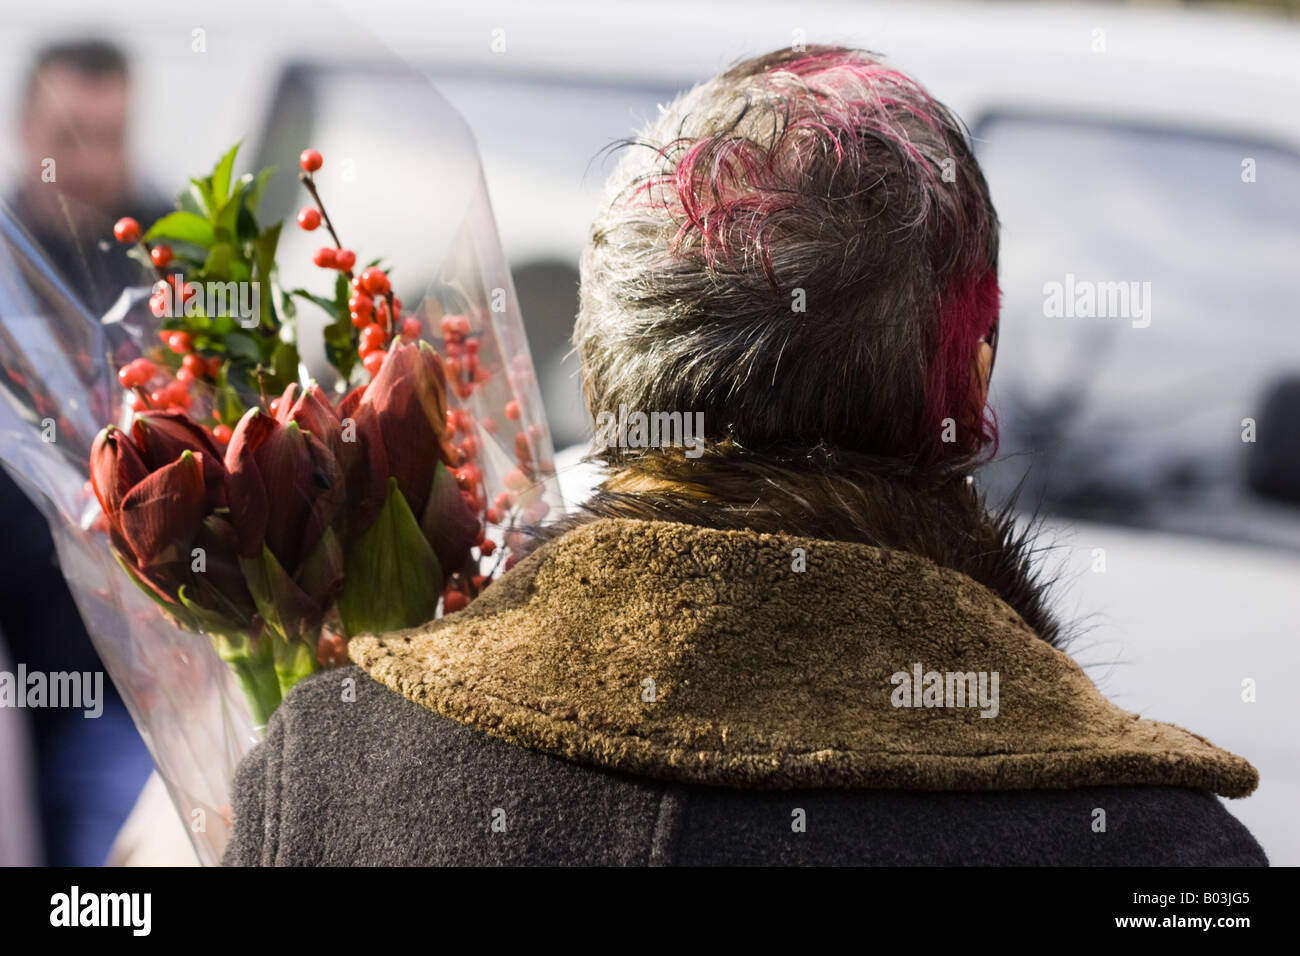 Woman in Columbia Road Flower Market, London - Stock Image